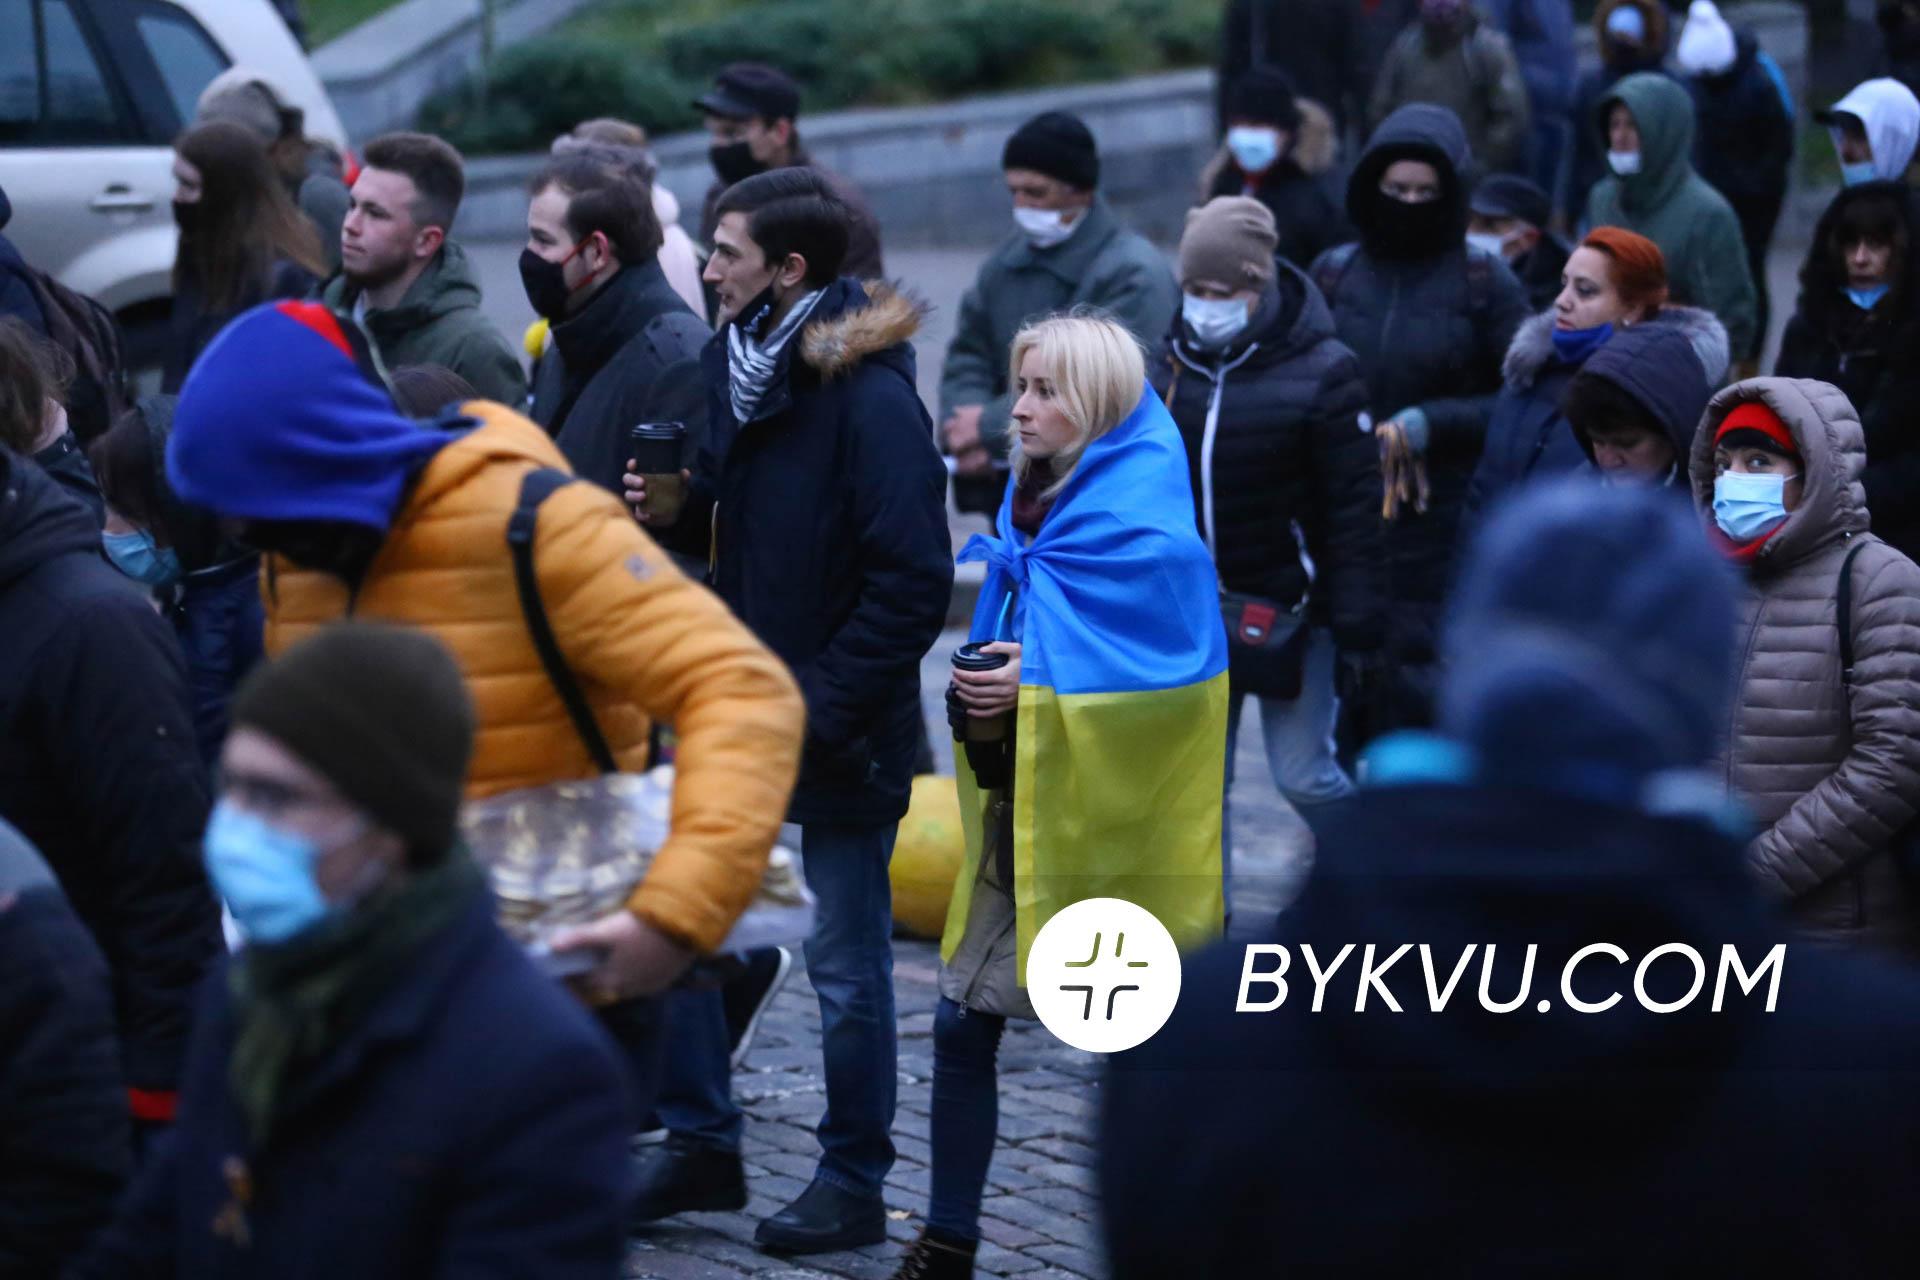 Хода у Києві 21 листопада